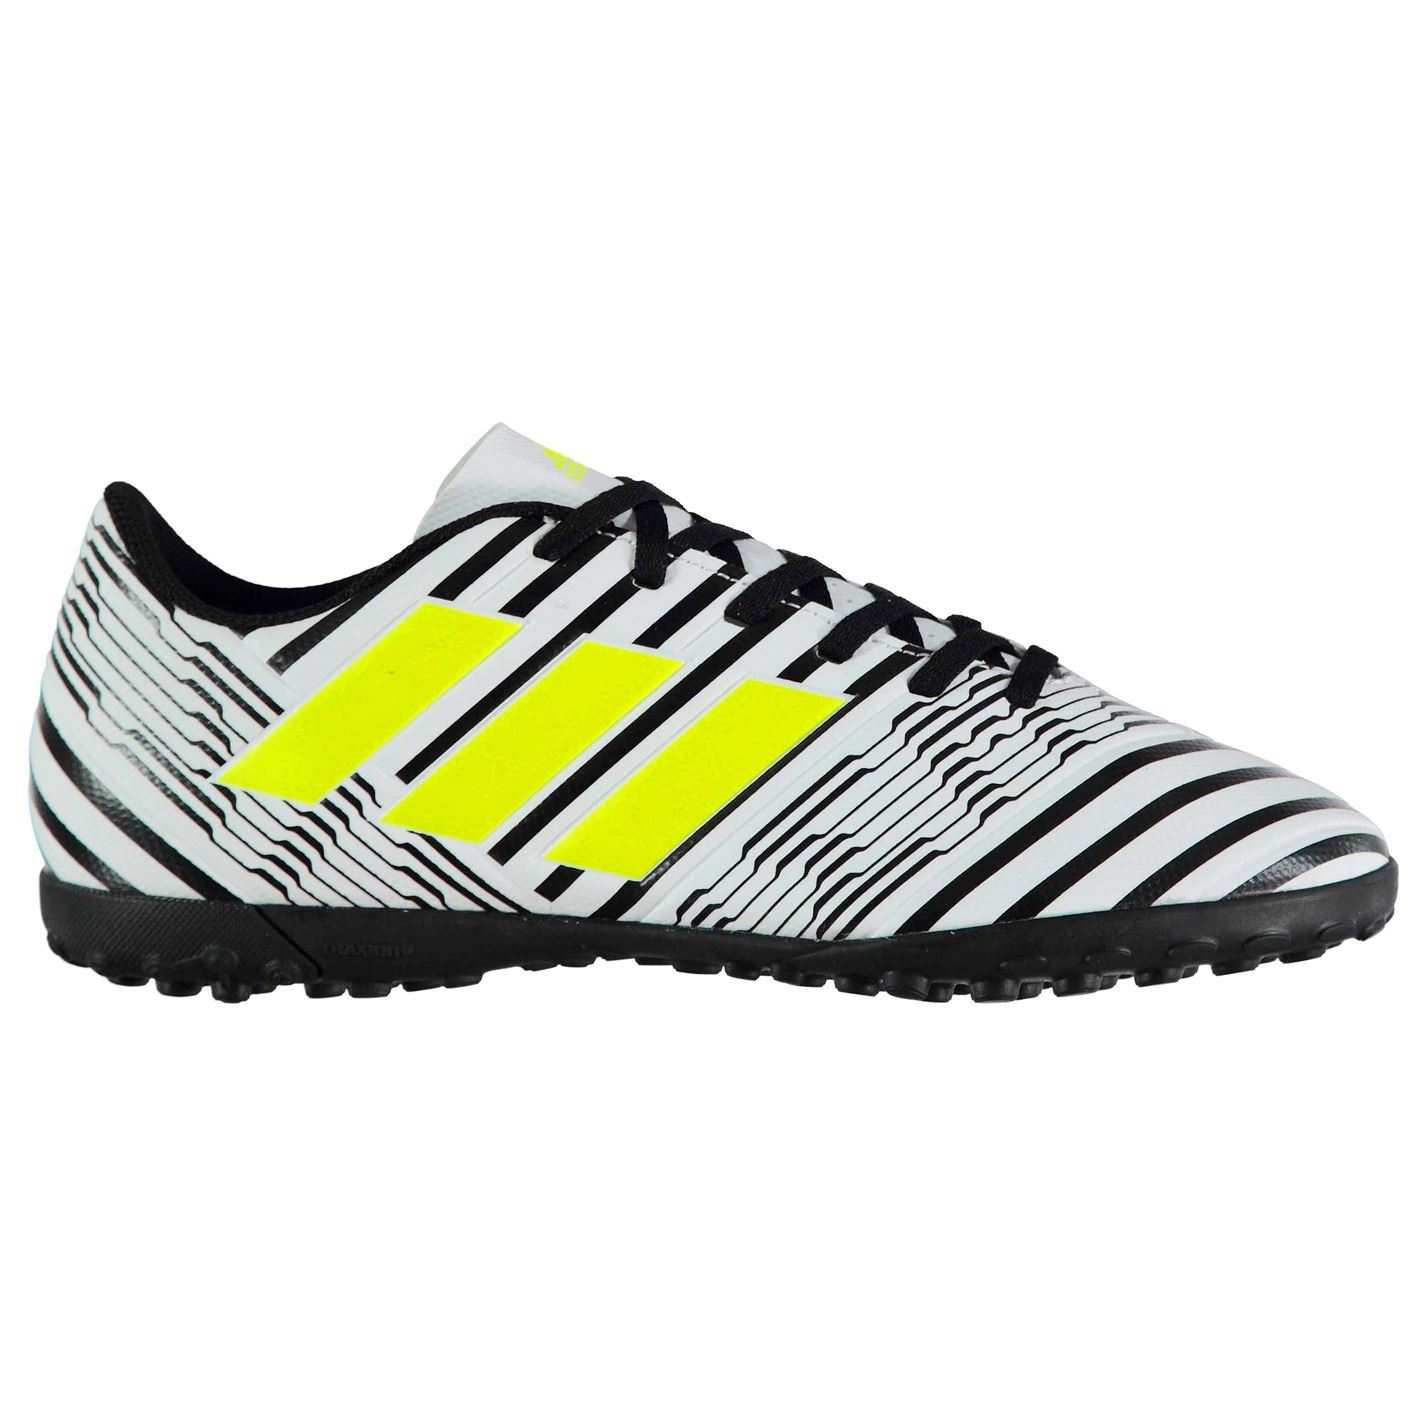 ... adidas Nemeziz 17.4 Astro Artificial Grass Trainers Juniors Wht/Yel  Soccer Shoes ...